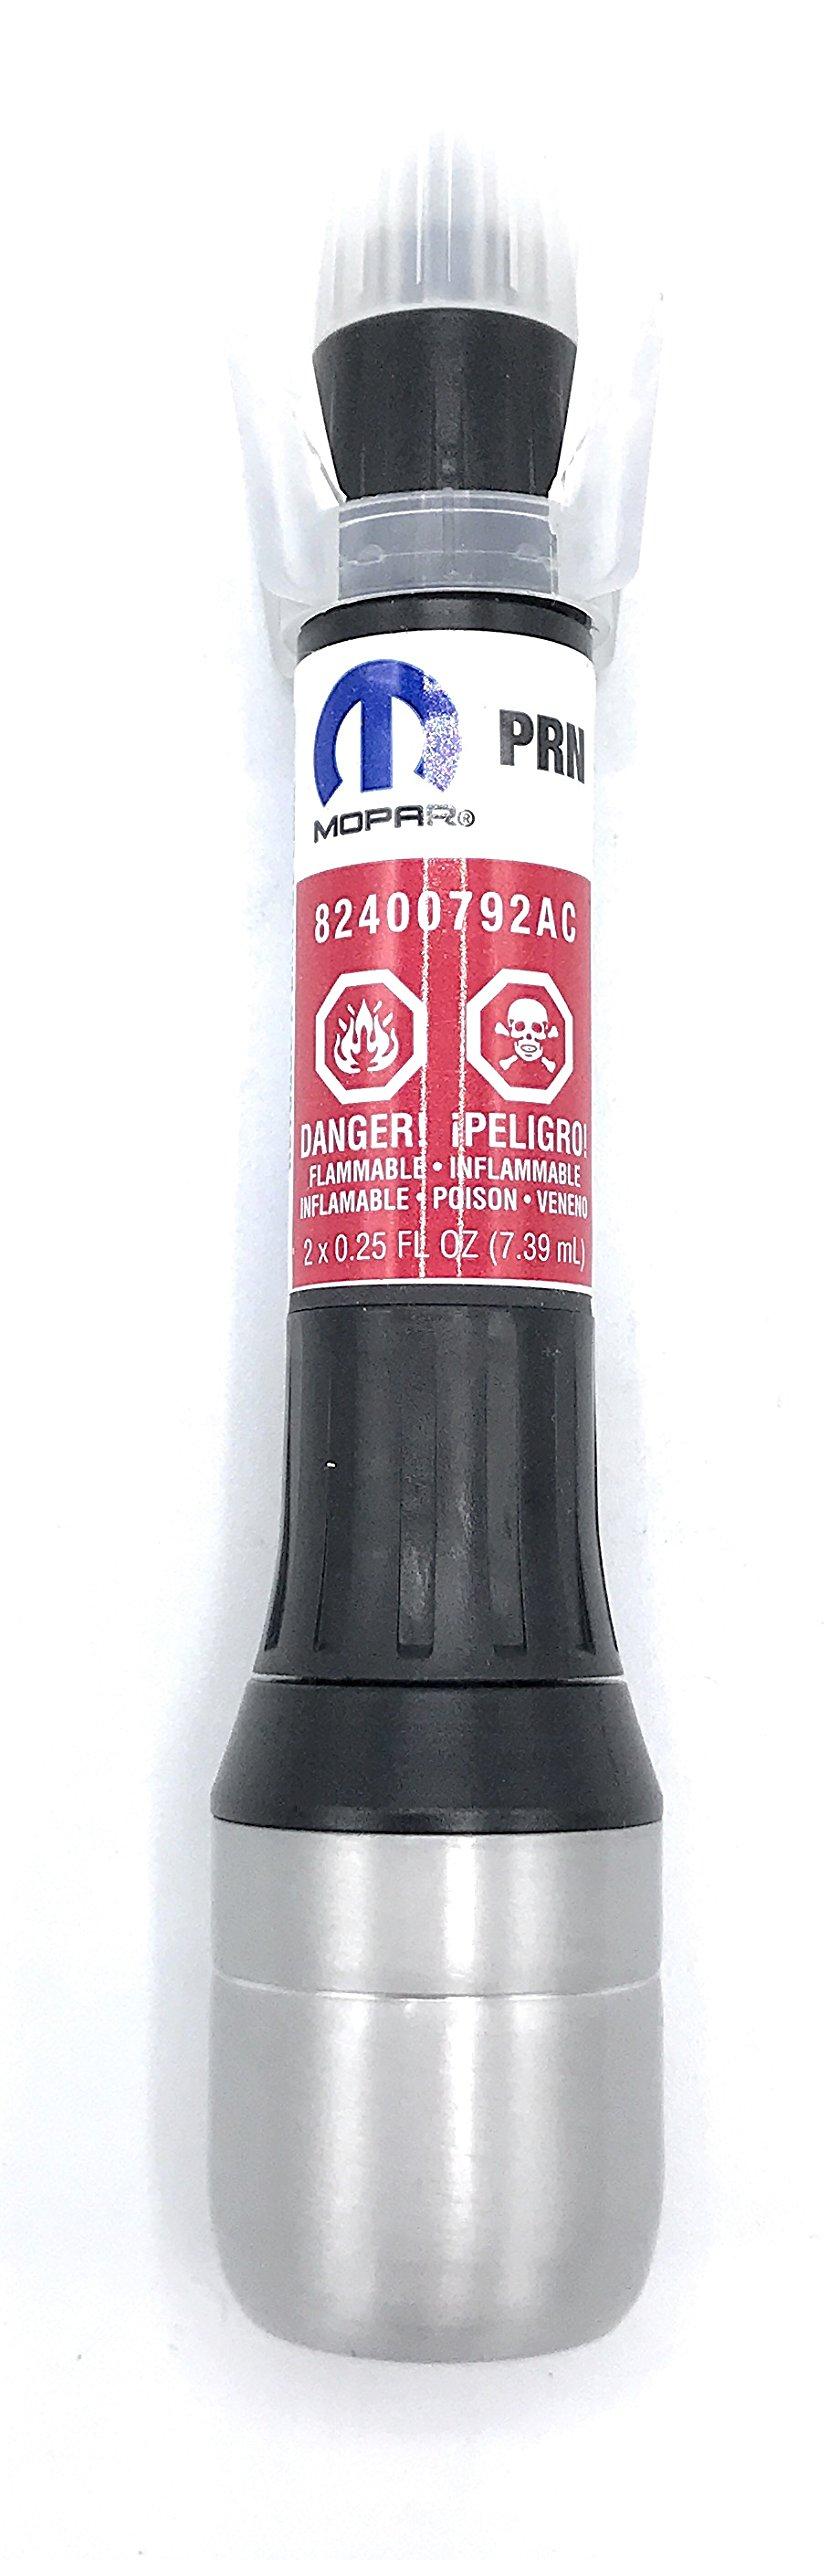 PRN VIPER RED CHRYSLER DODGE MOPAR TOUCH UP PAINT OEM